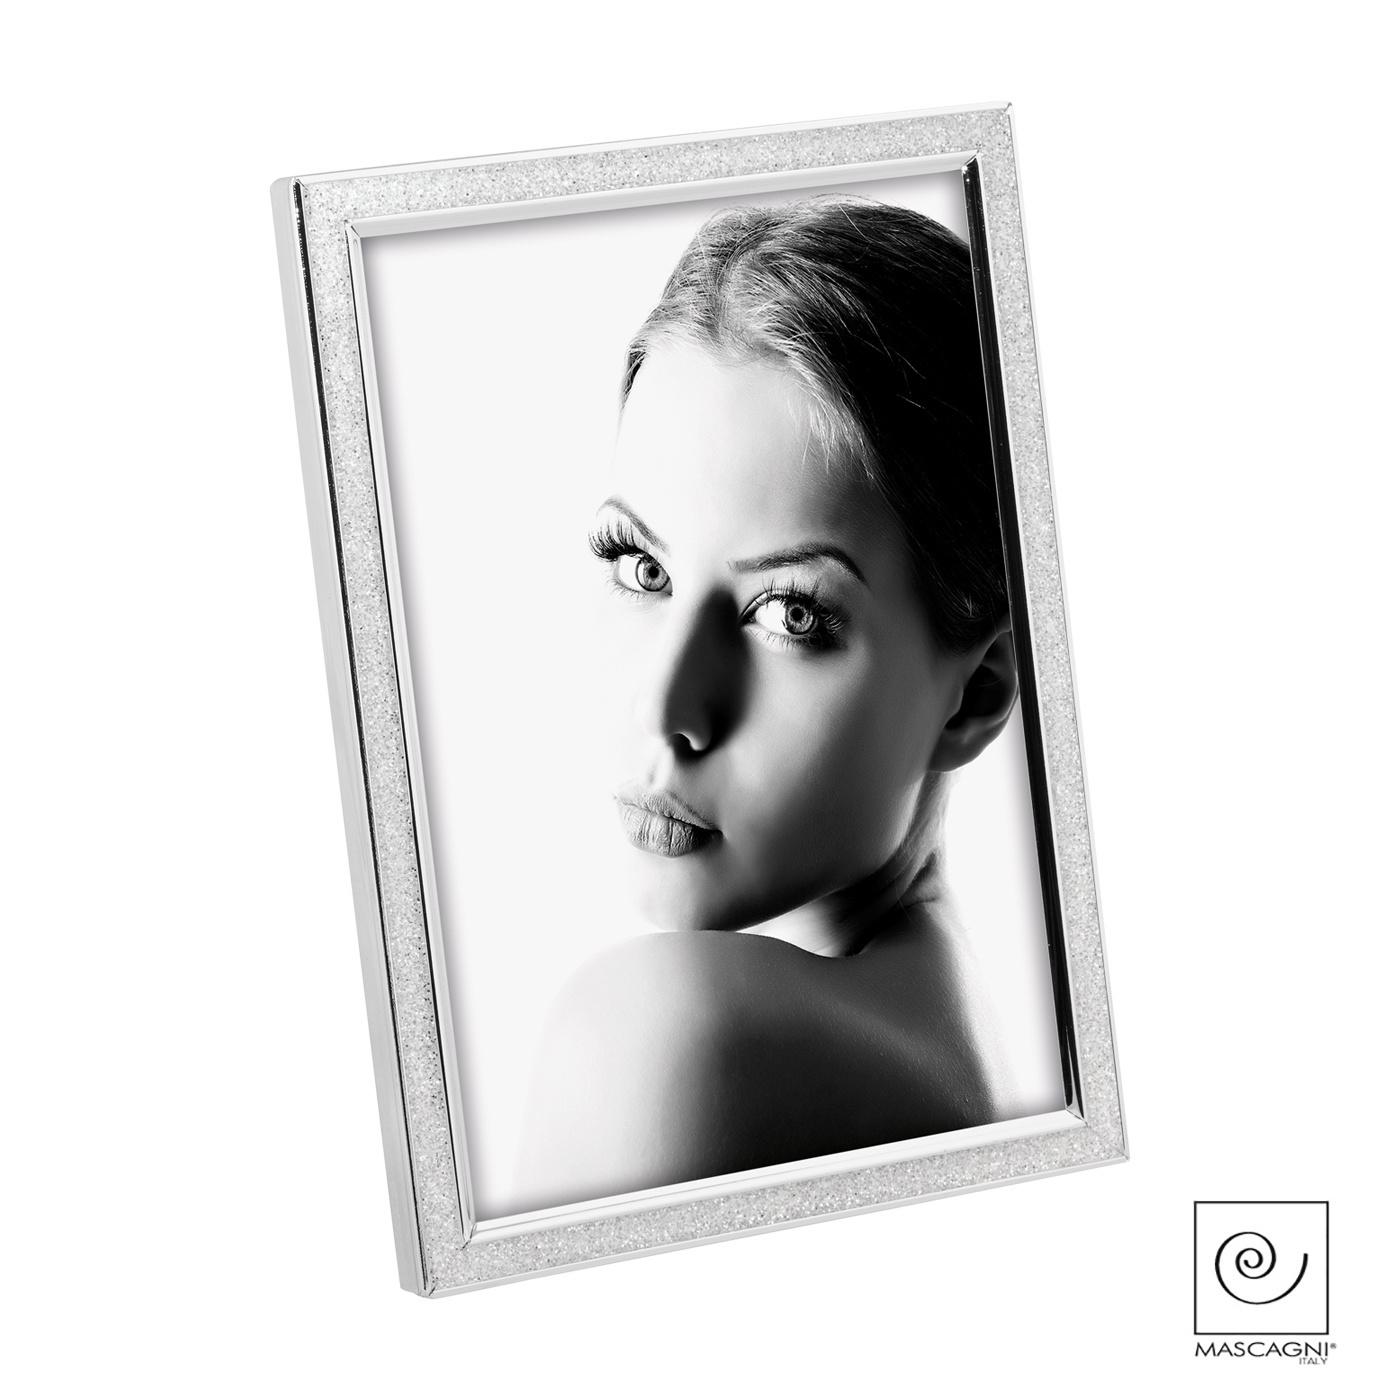 Art Mascagni A1066 PHOTO FRAME 13X18 - COL.SILVER